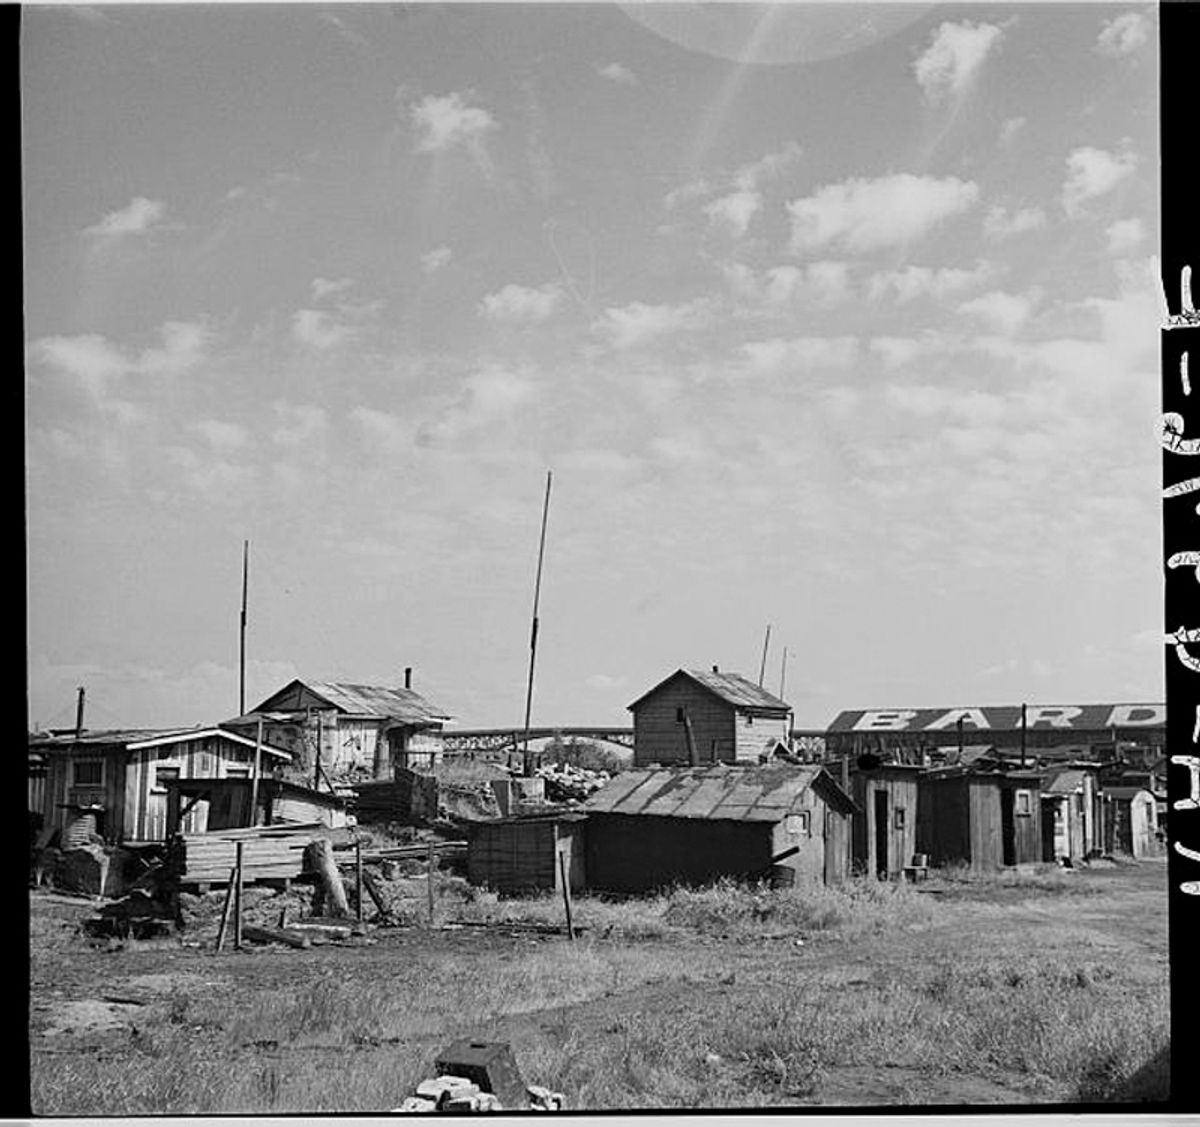 Squatters' shacks along the Willamette River, Portland, Oregon in 1936.